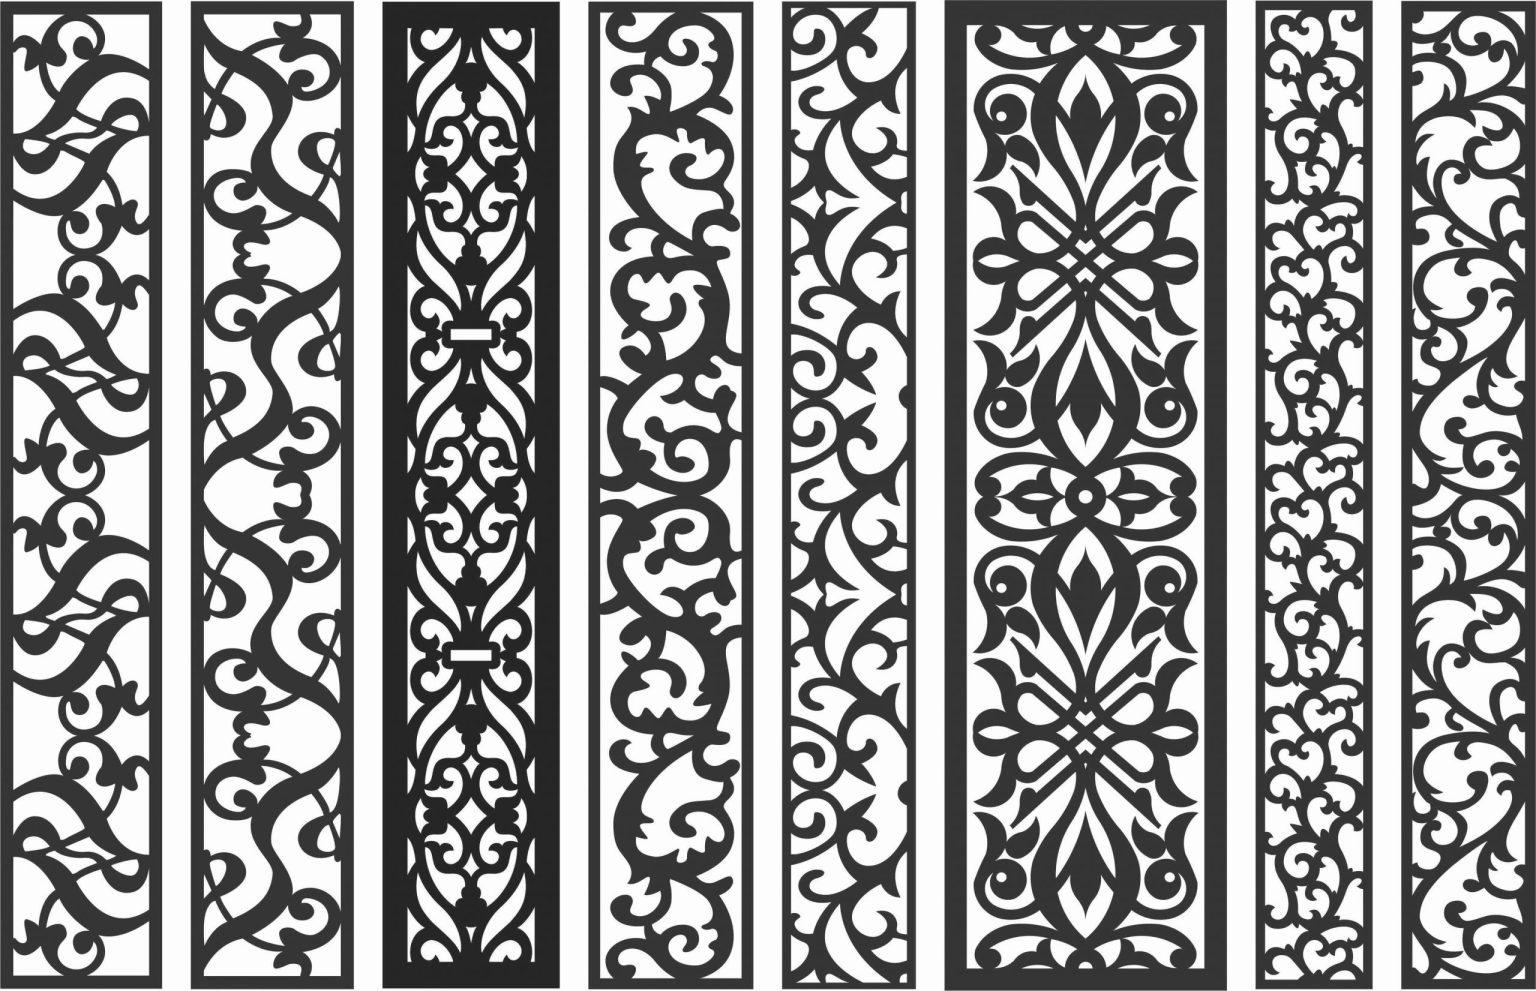 Screen Panel Patterns Seamless 40 Free DXF File